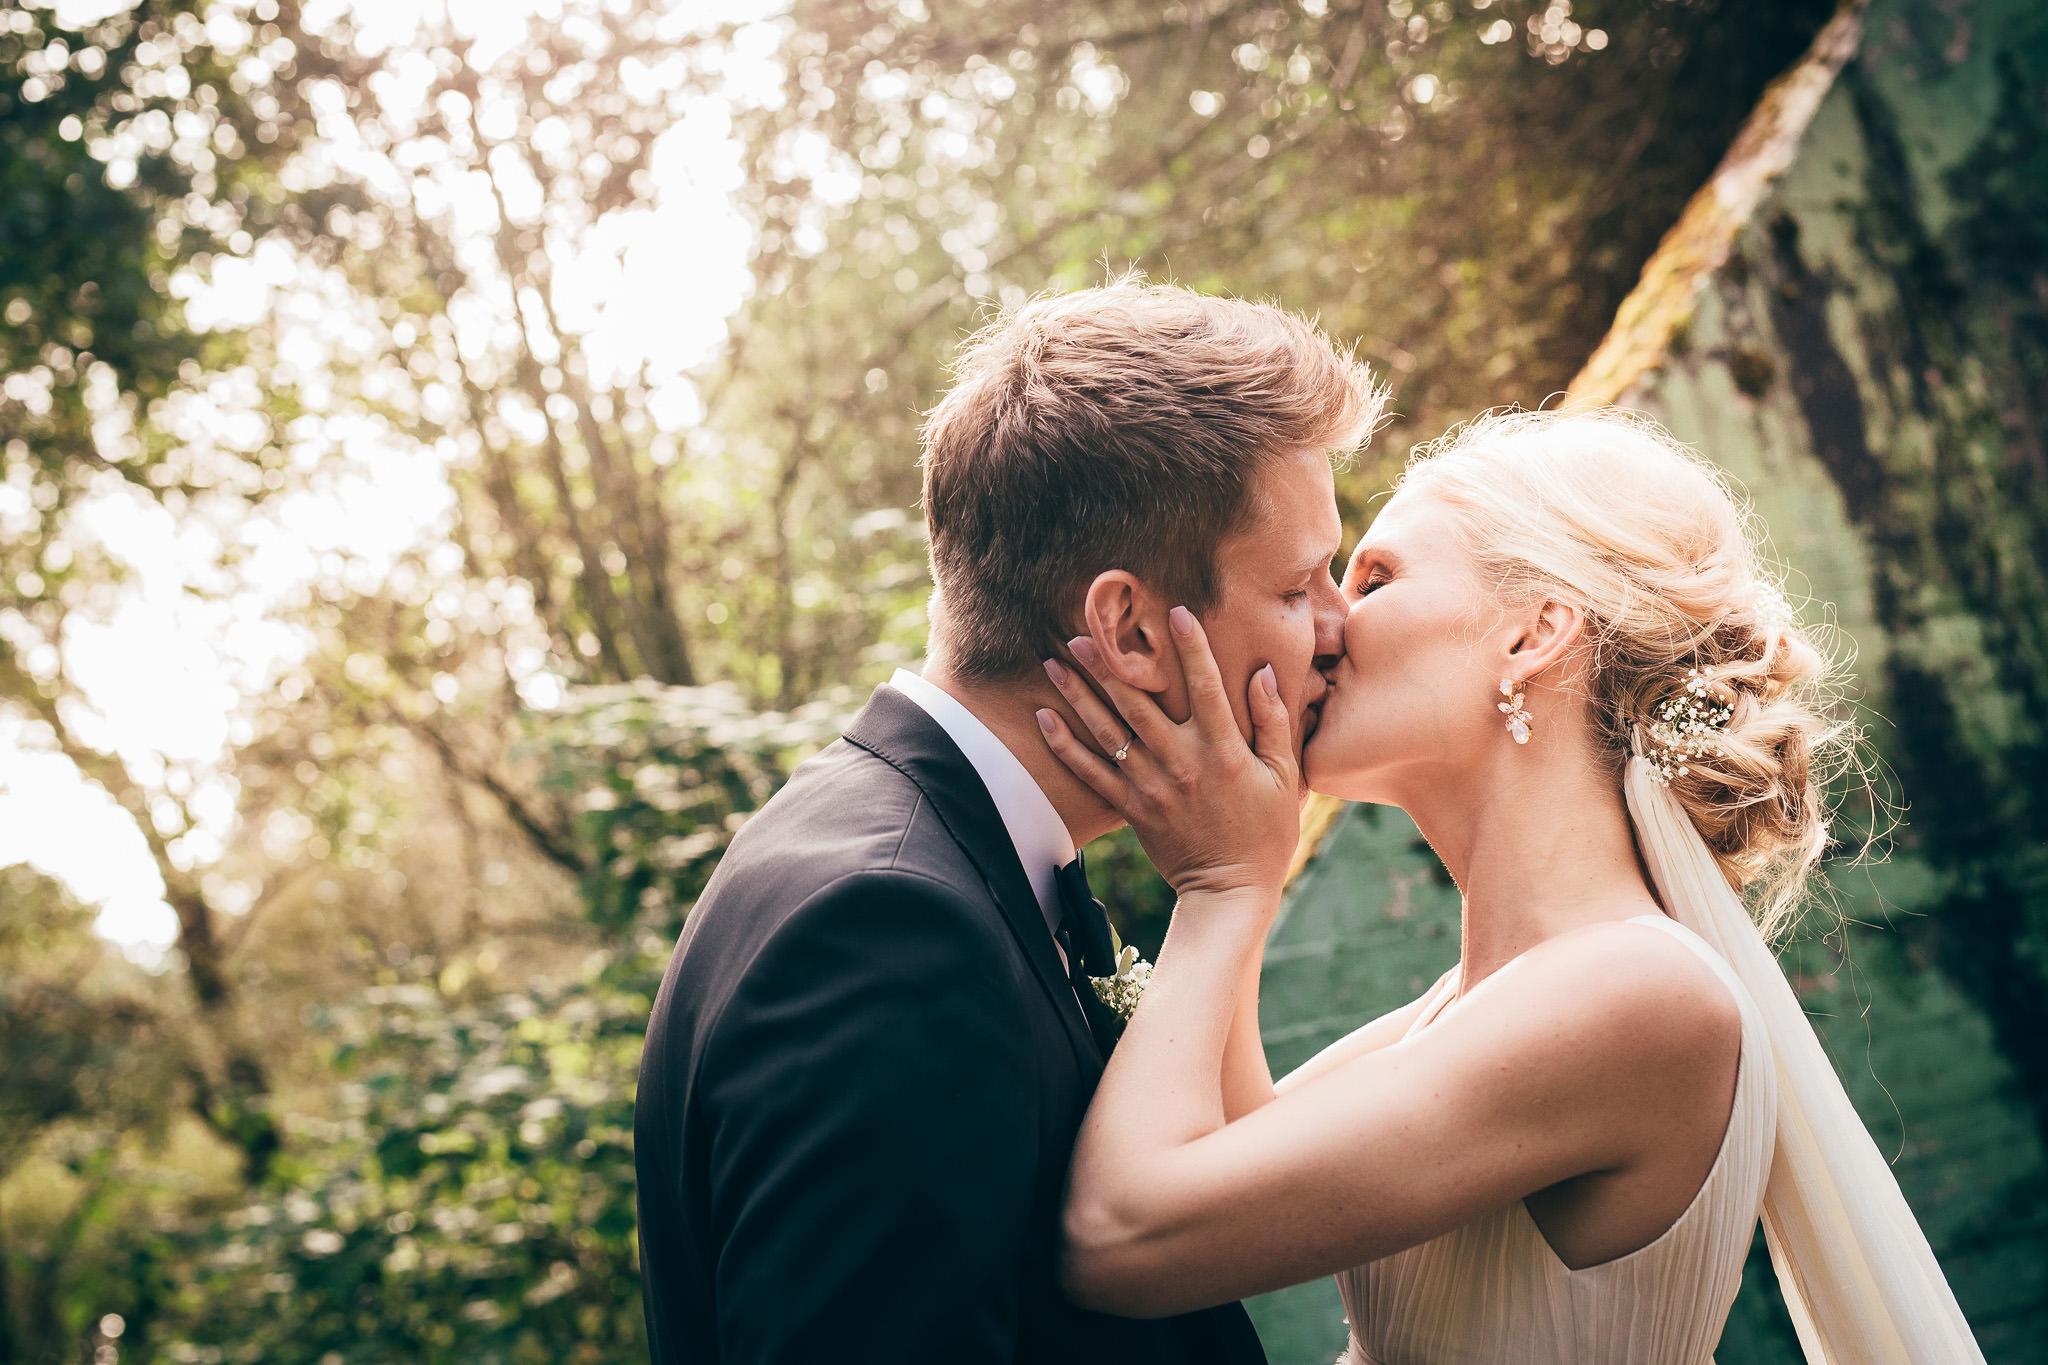 Norway+wedding+photographer+elopement+pre+wedding+Rogaland+bryllupsfotograf+Casey+Arneson-207.jpg